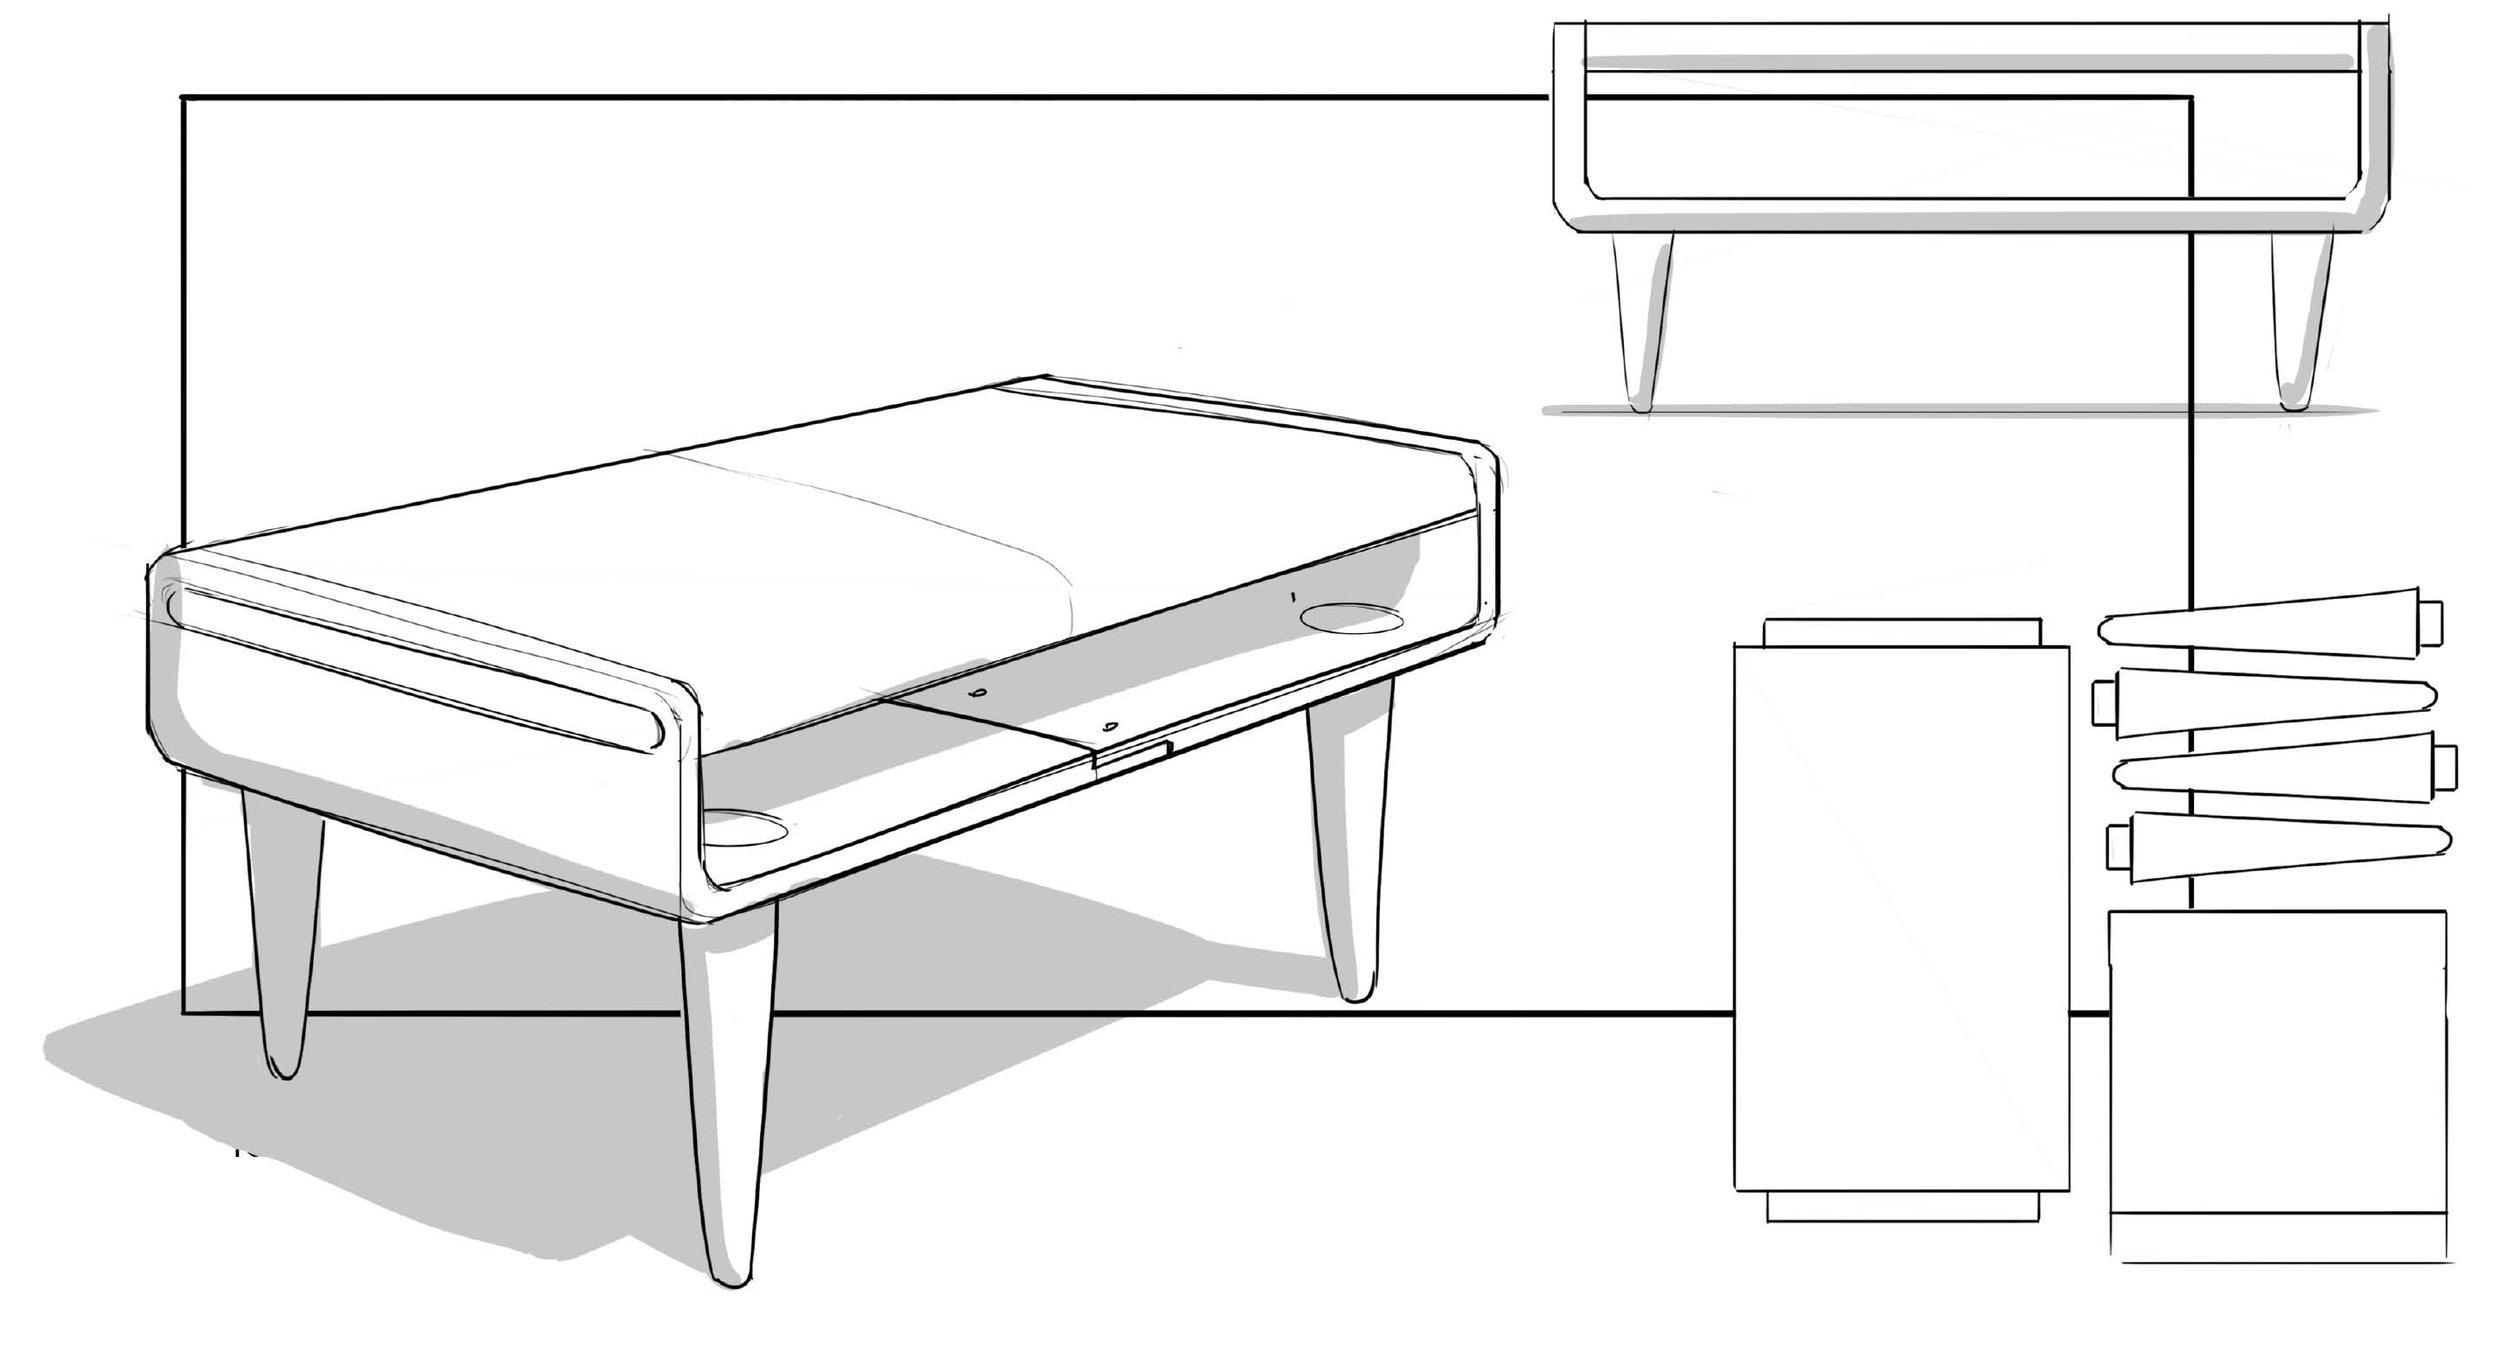 mu table.jpg